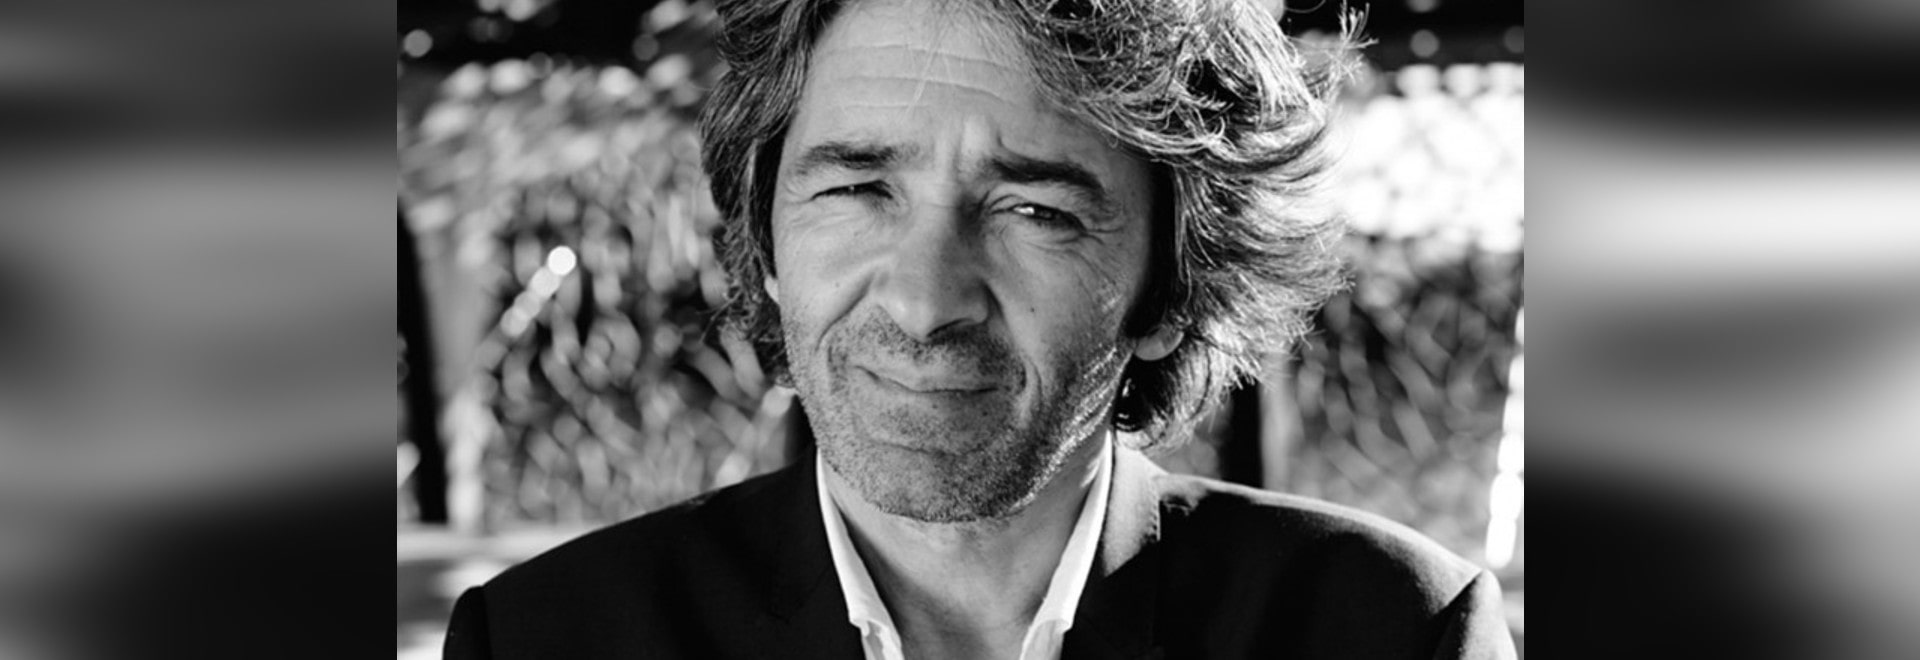 Architekten Scheinwerfer Rudy Ricciotti Bandol France